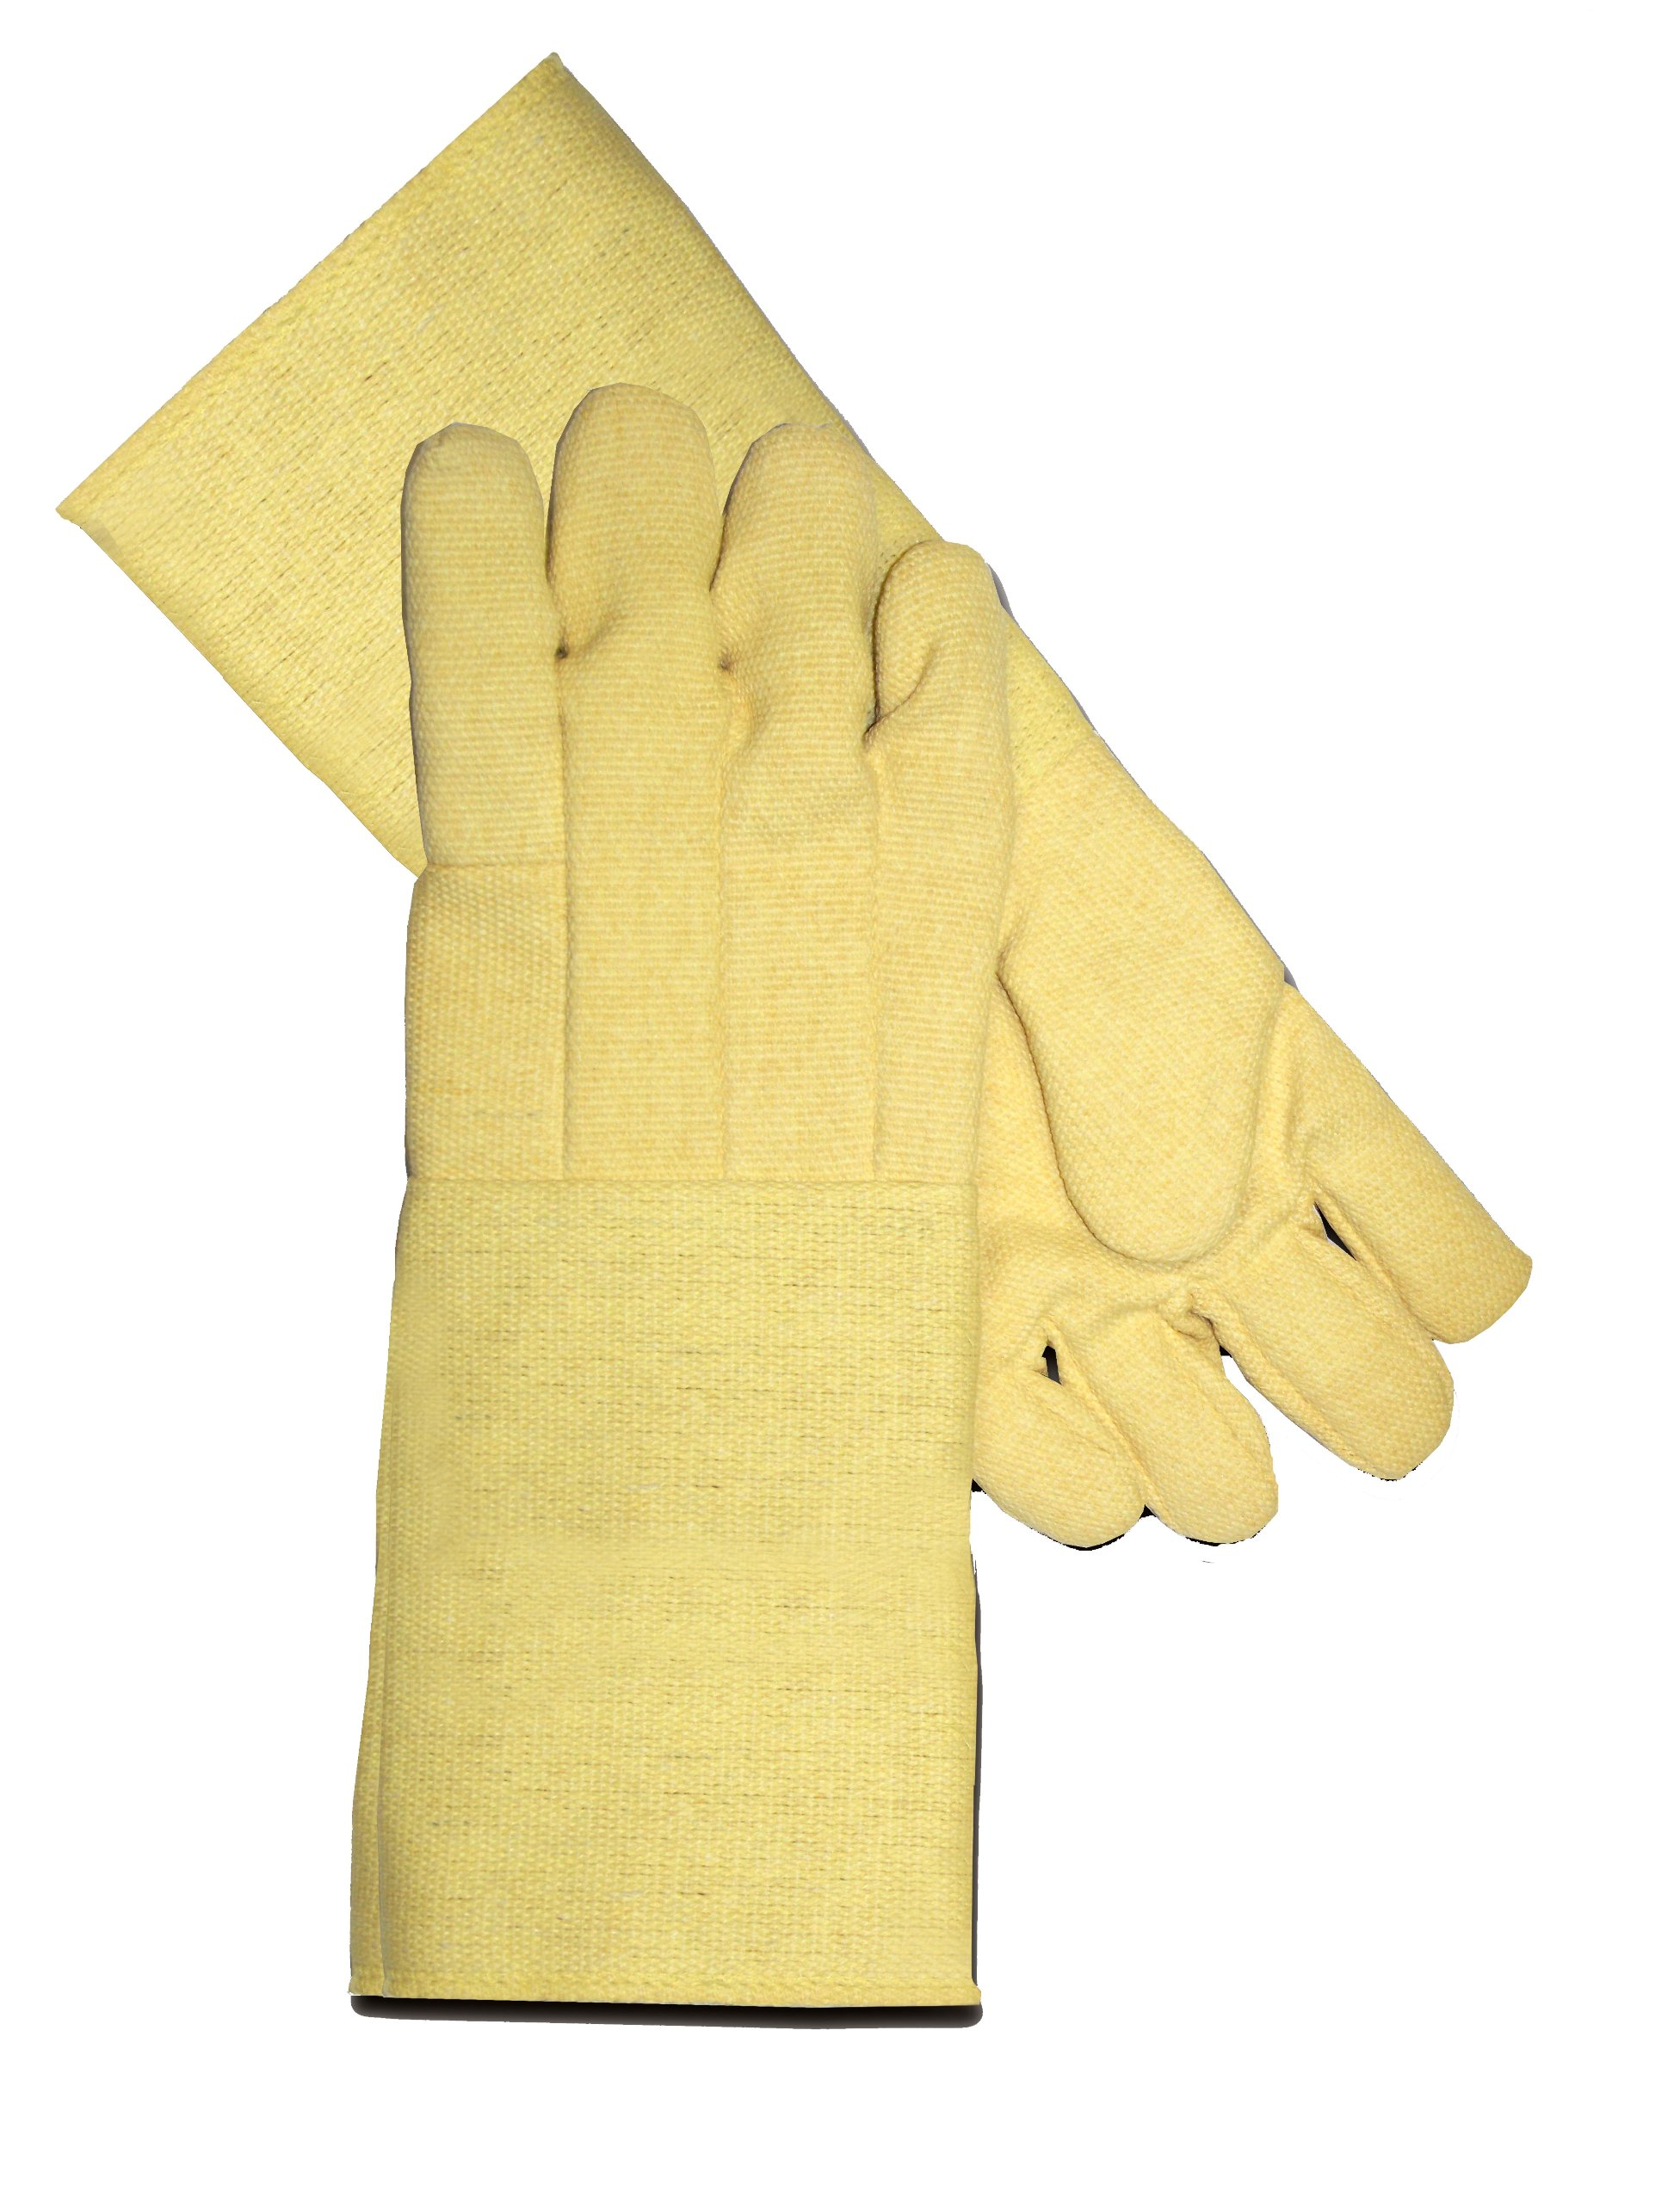 Steel Grip TH210-23F Thermonol High Heat Glove, 23-Inch, 1-Pair